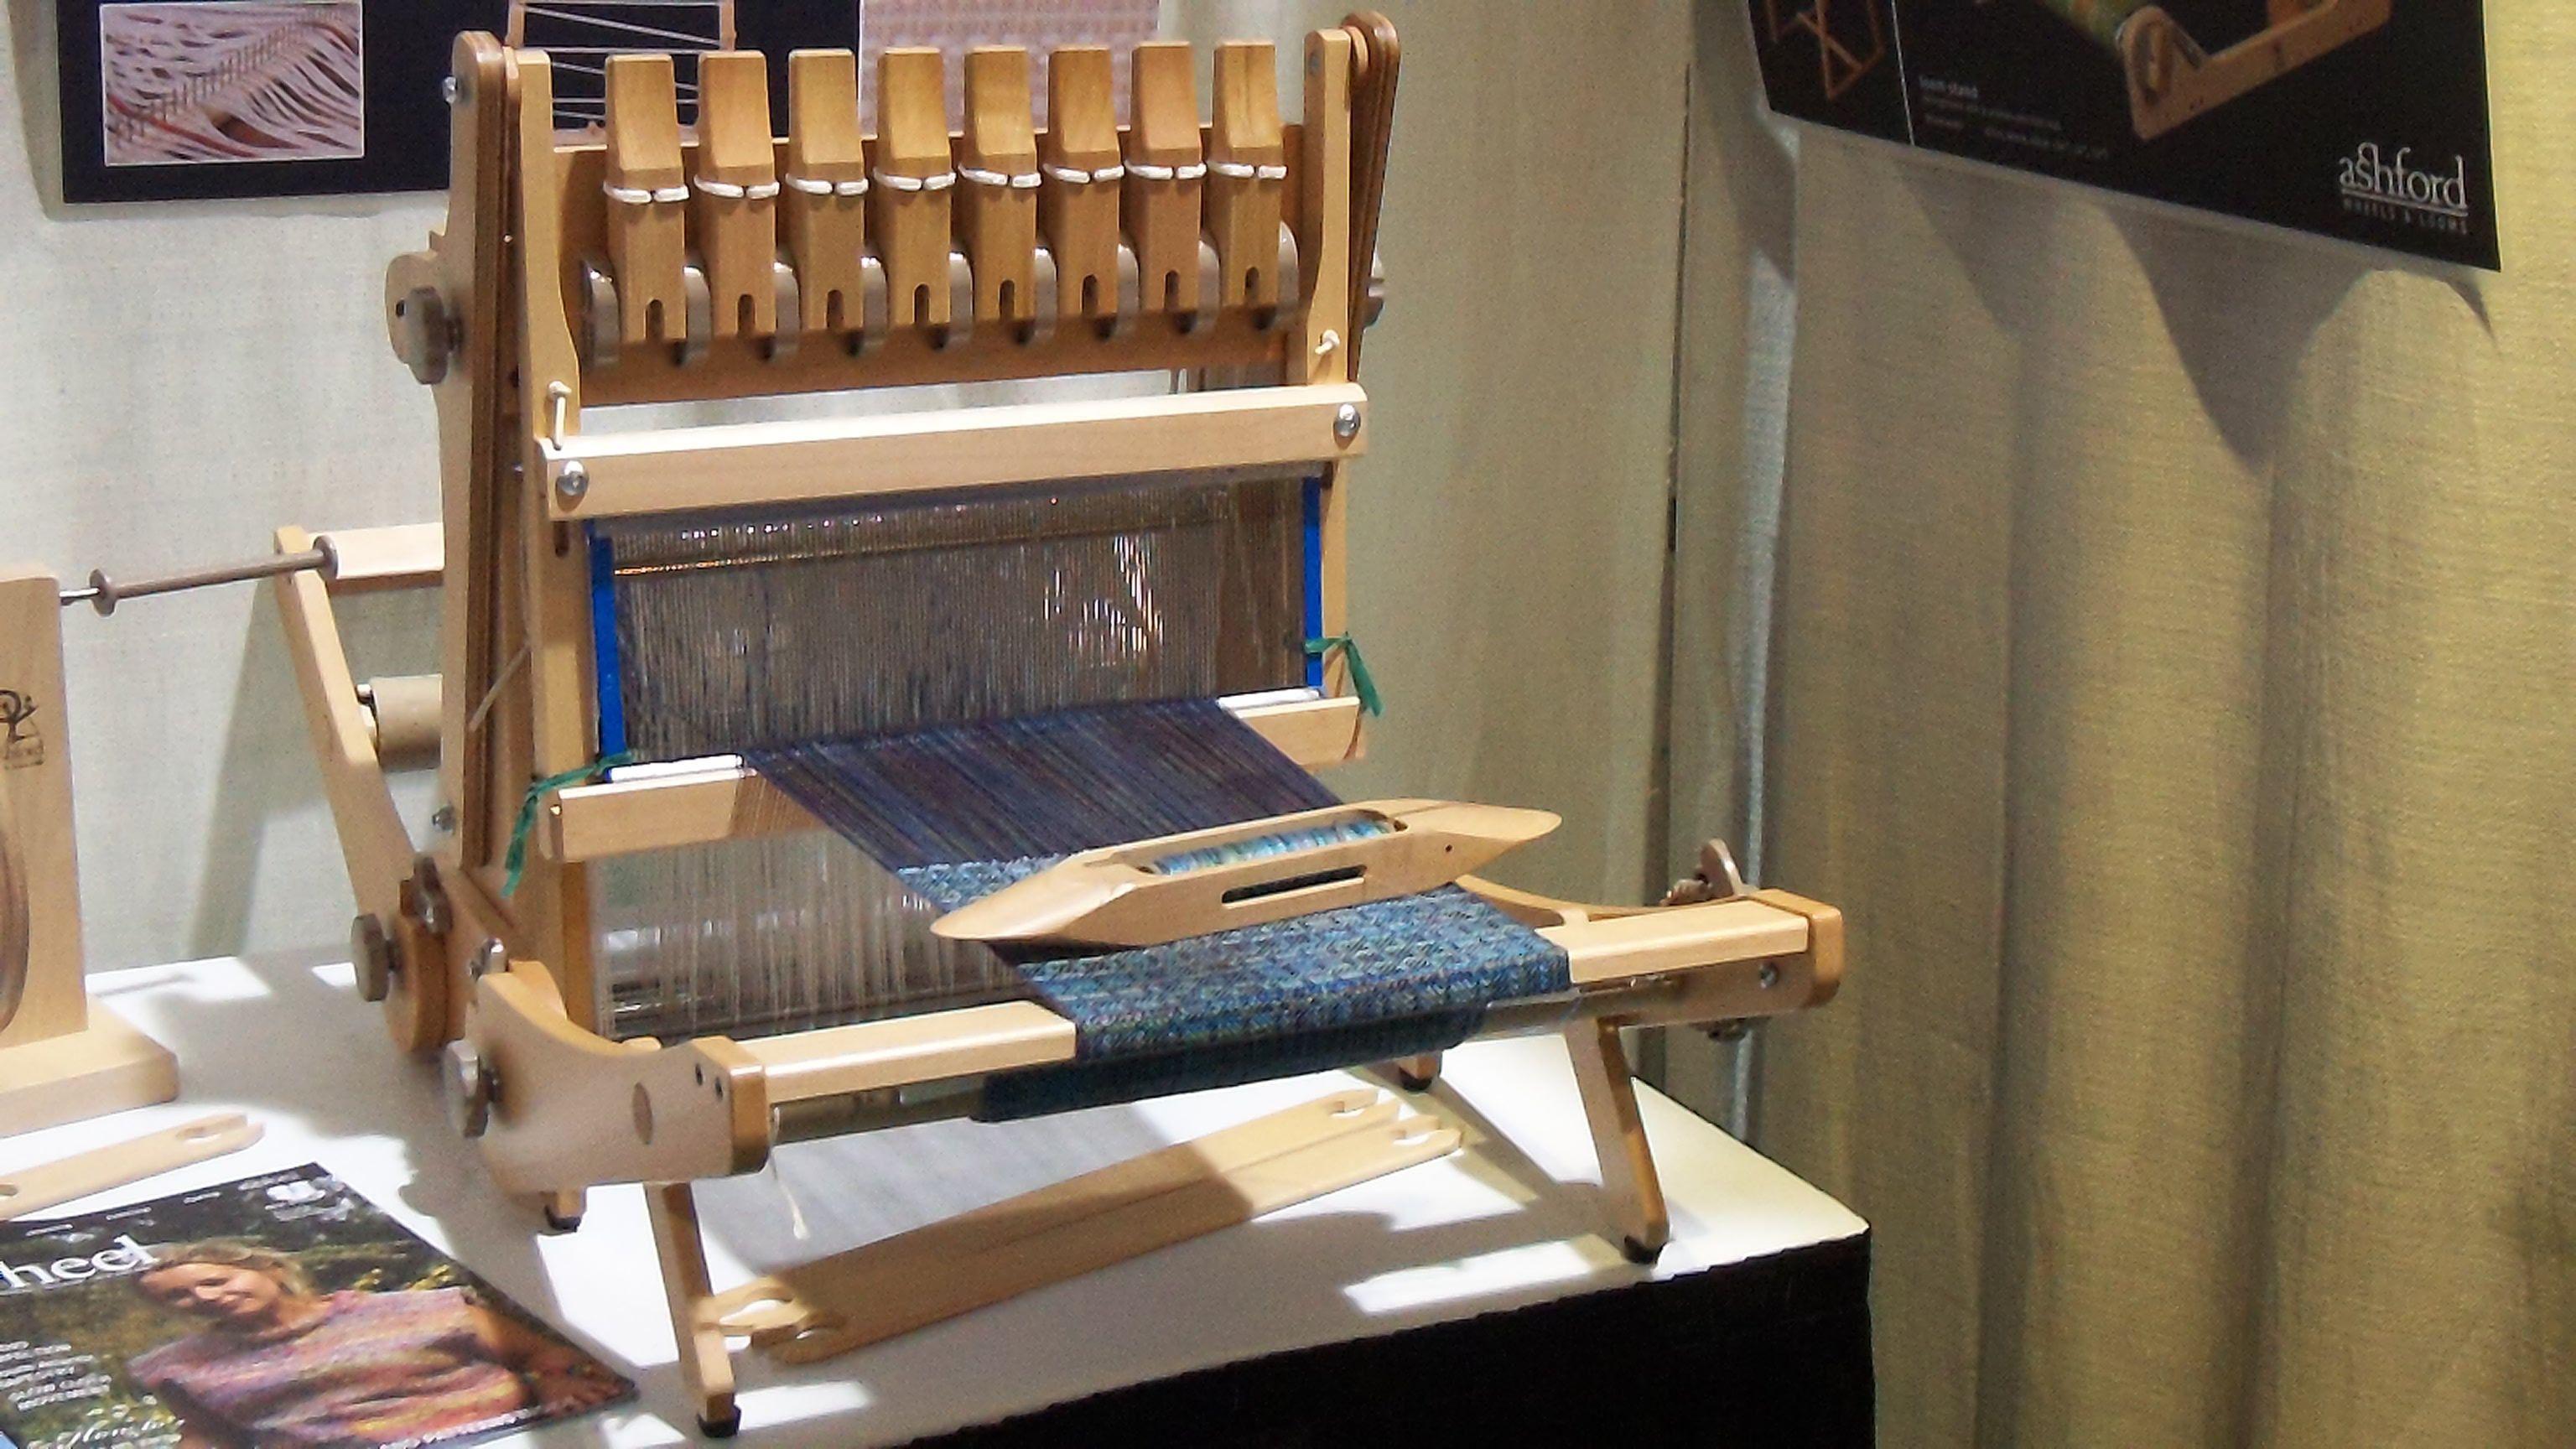 ashford katie loom - Google Search | Looms, wheels and